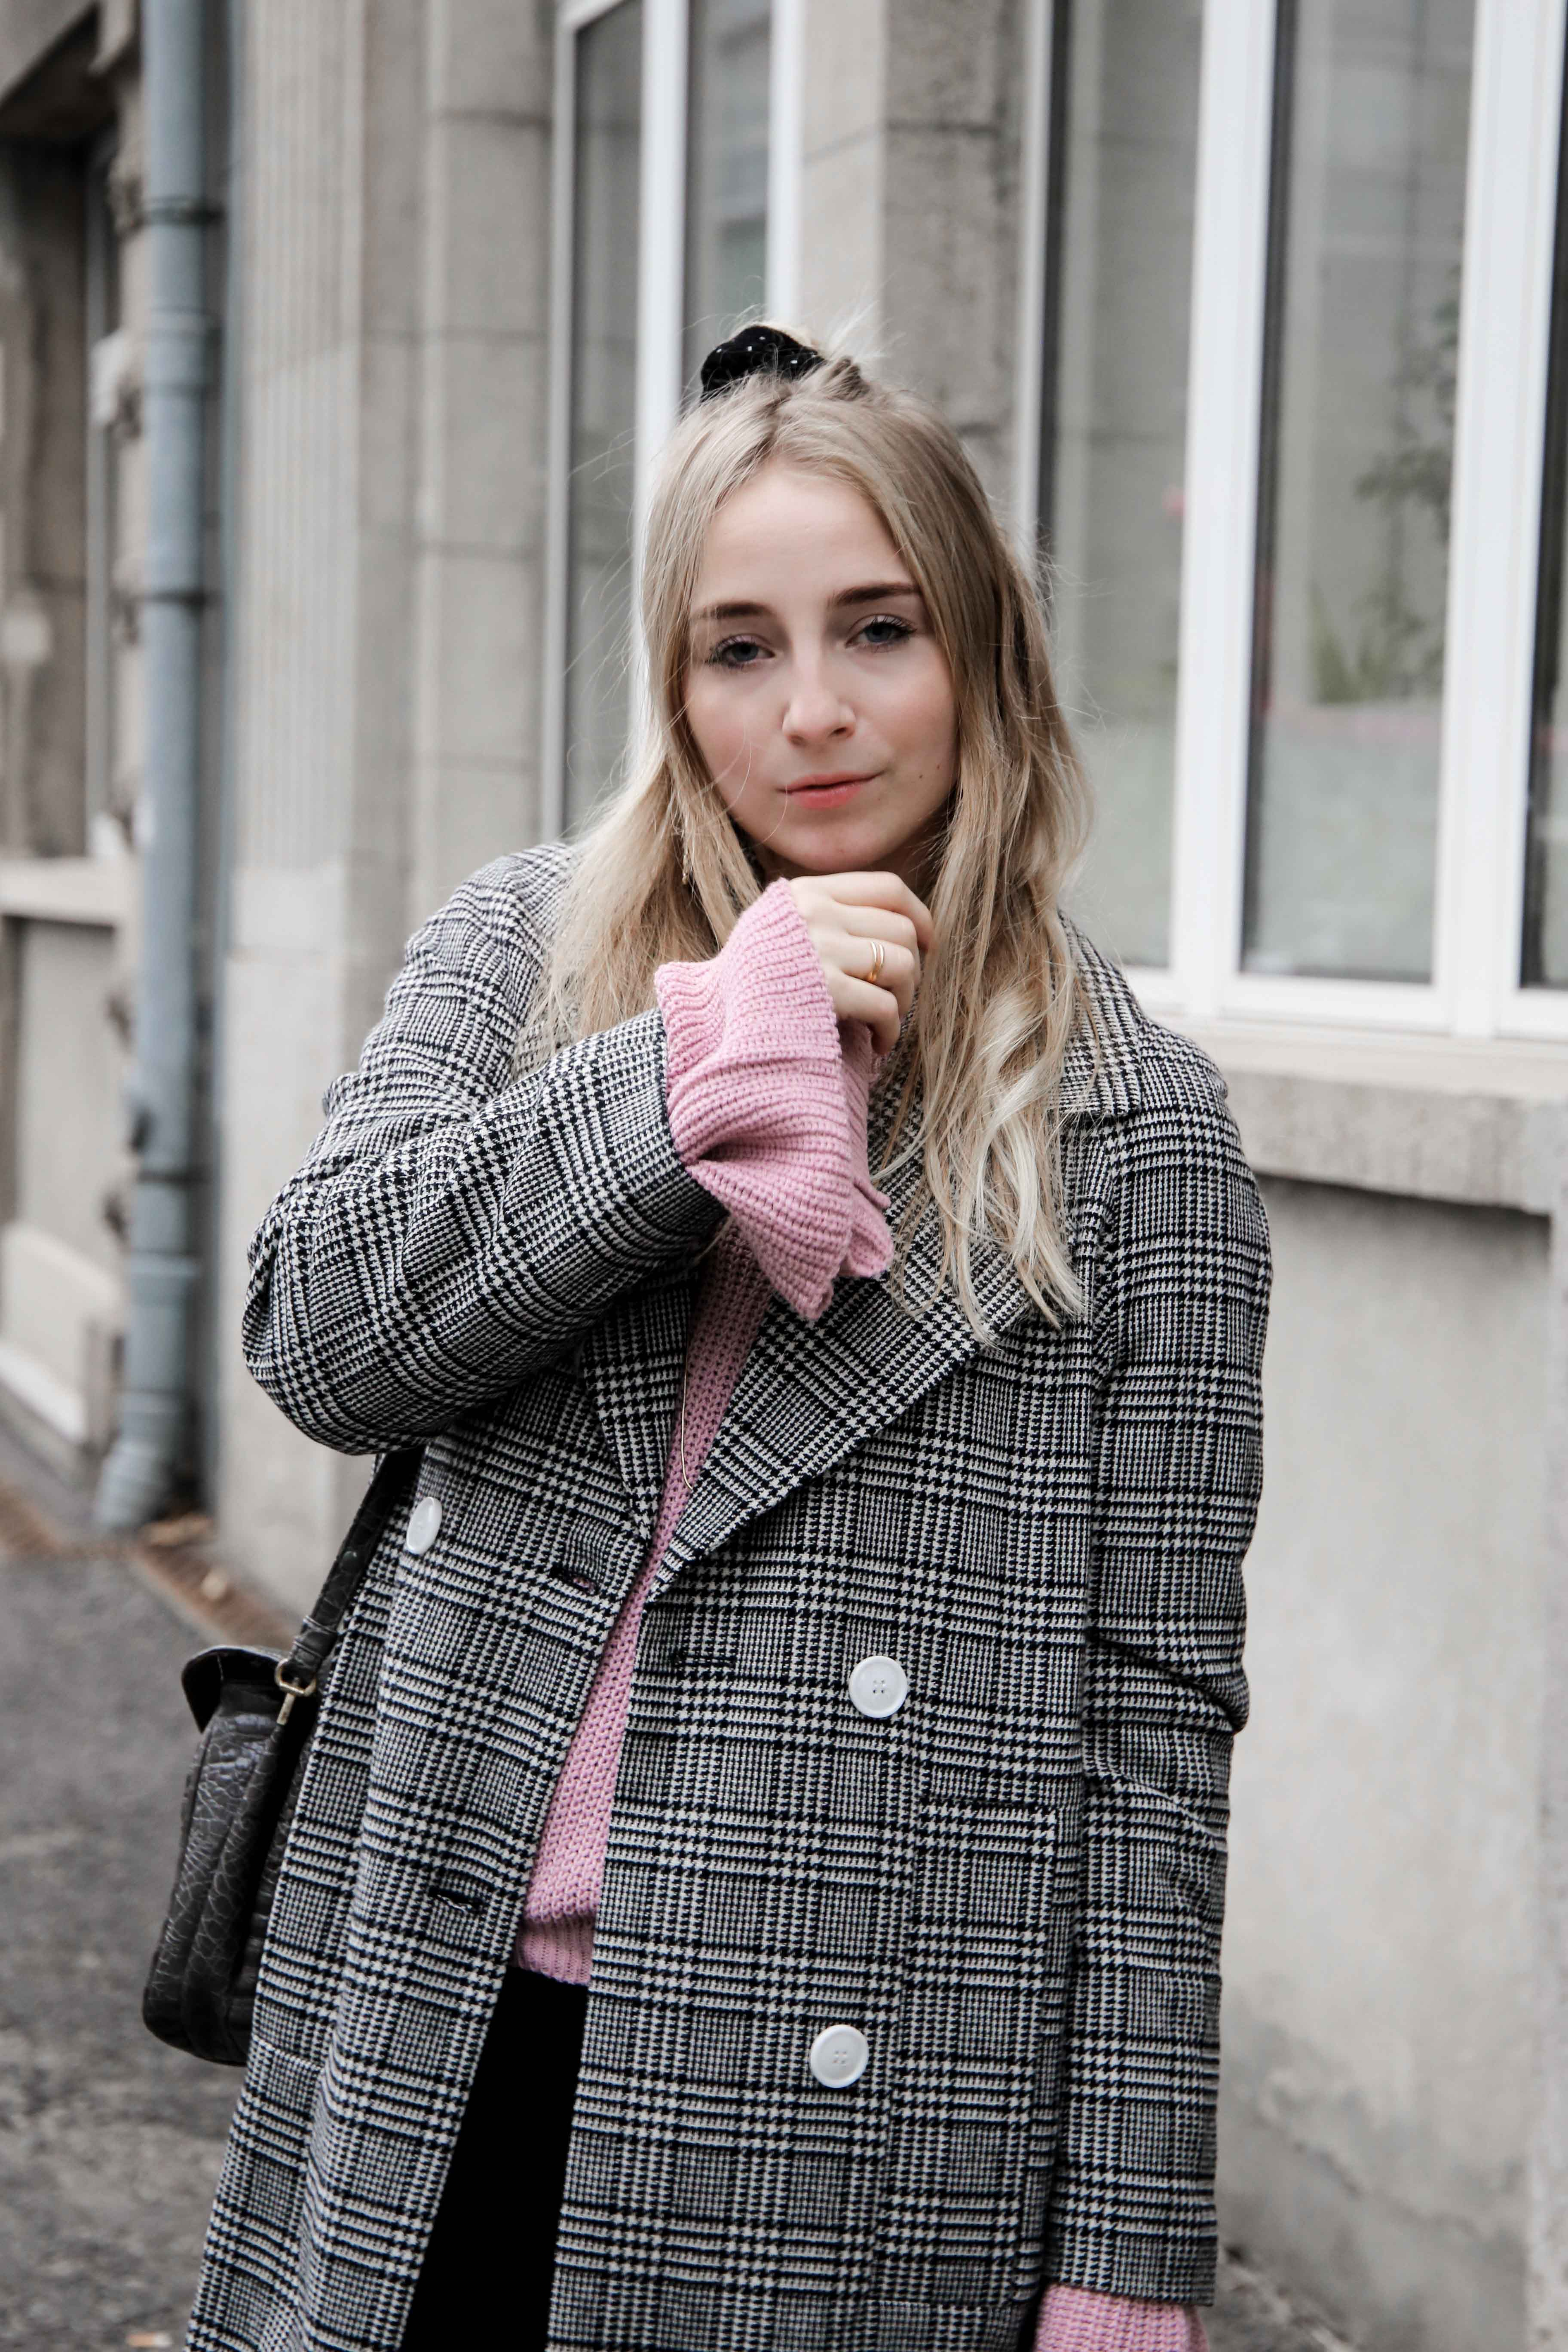 herbst-outfit-glencheck-muster-mantel-mode-blog-köln-trompetenärmel